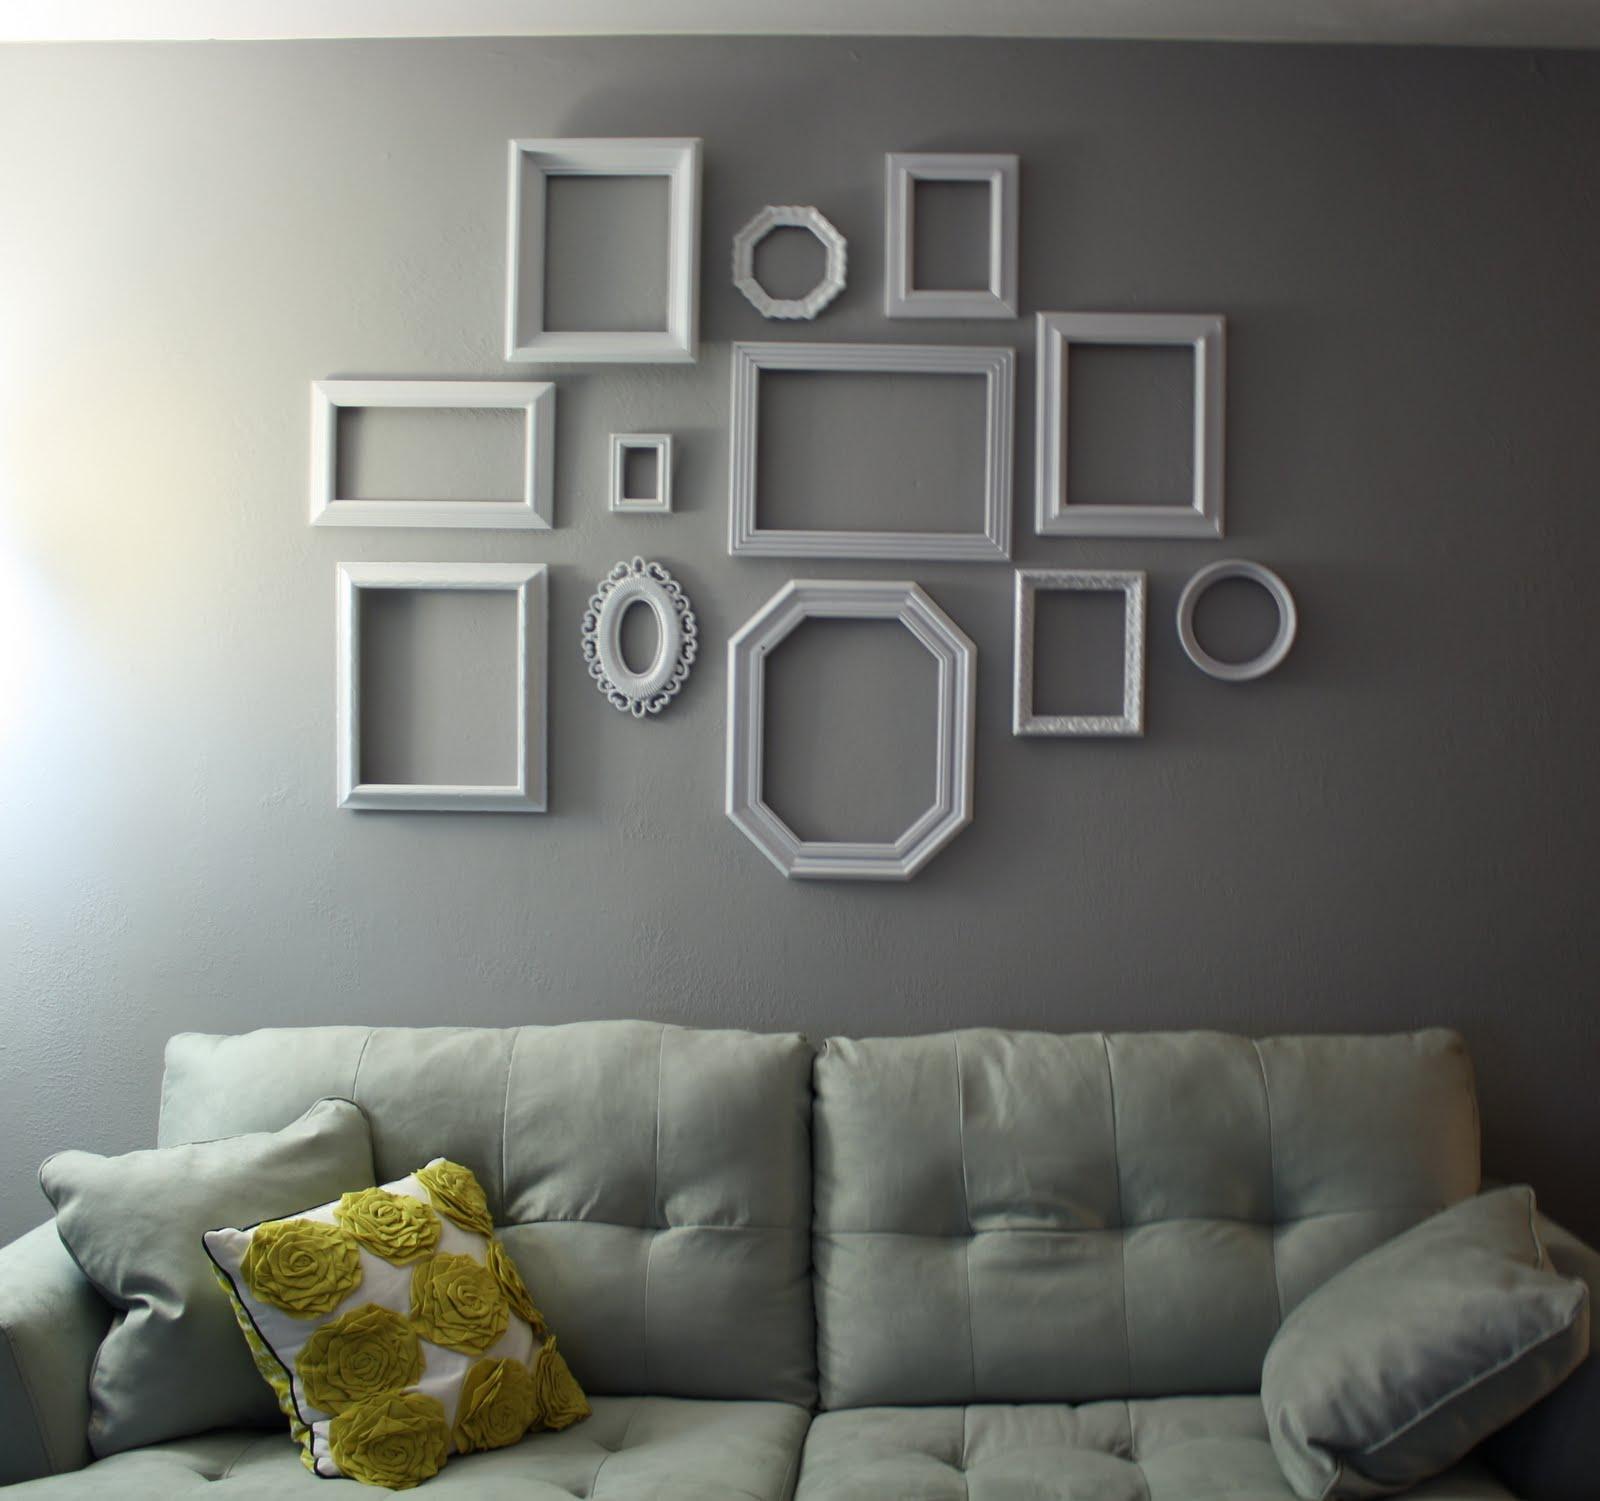 Come decorare una parete vuota dj62 regardsdefemmes - Decorare i muri di casa ...